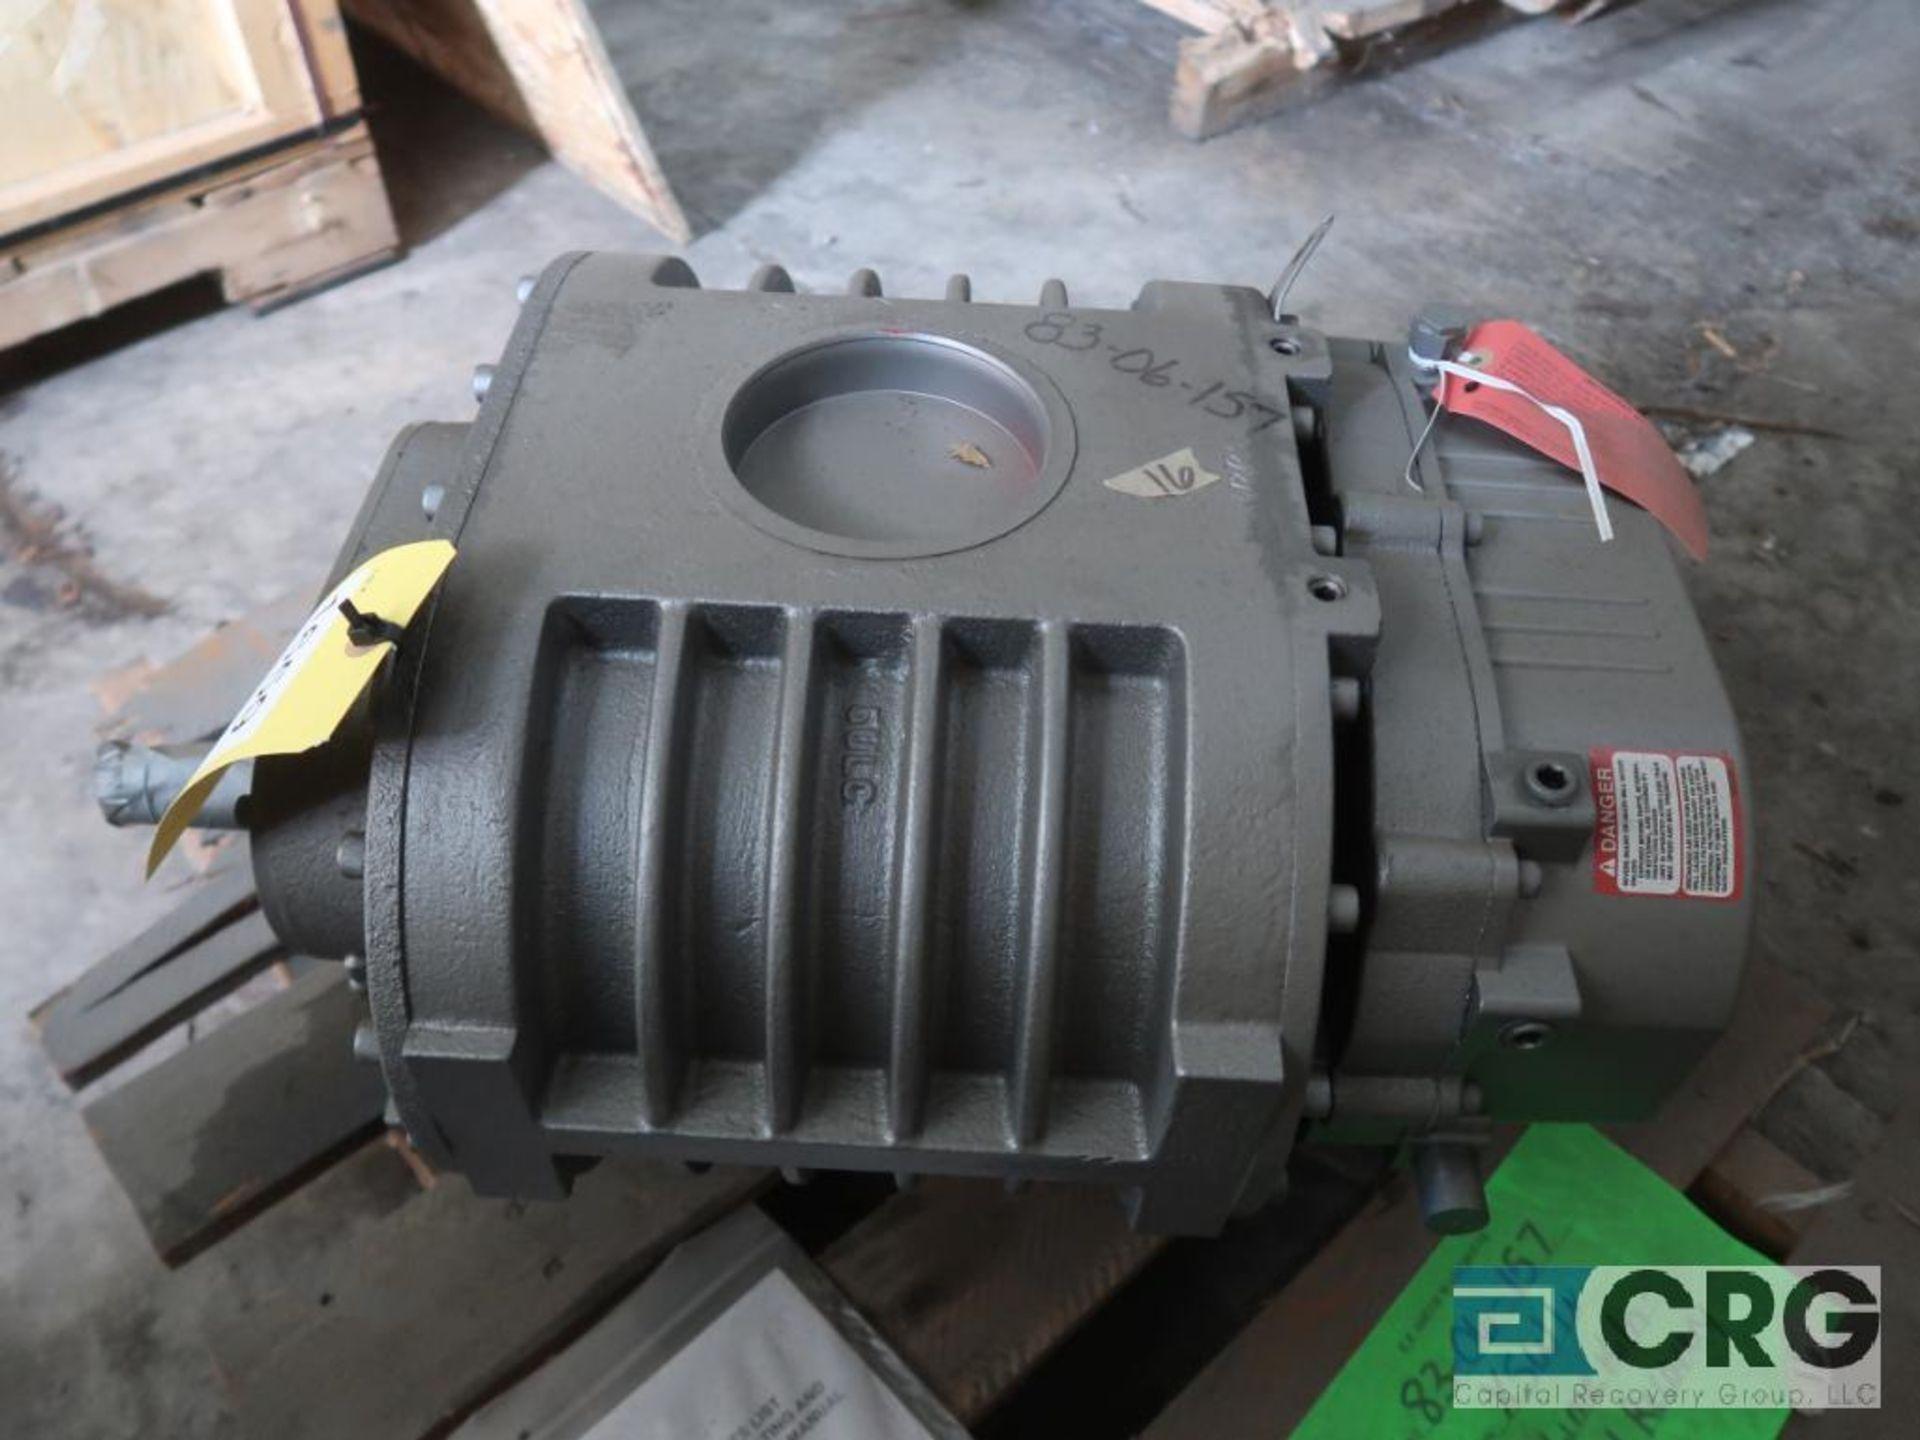 Gardner Denver GAELDRA 5 LR rotary blower, s/n 472724 (Off Site Warehouse)